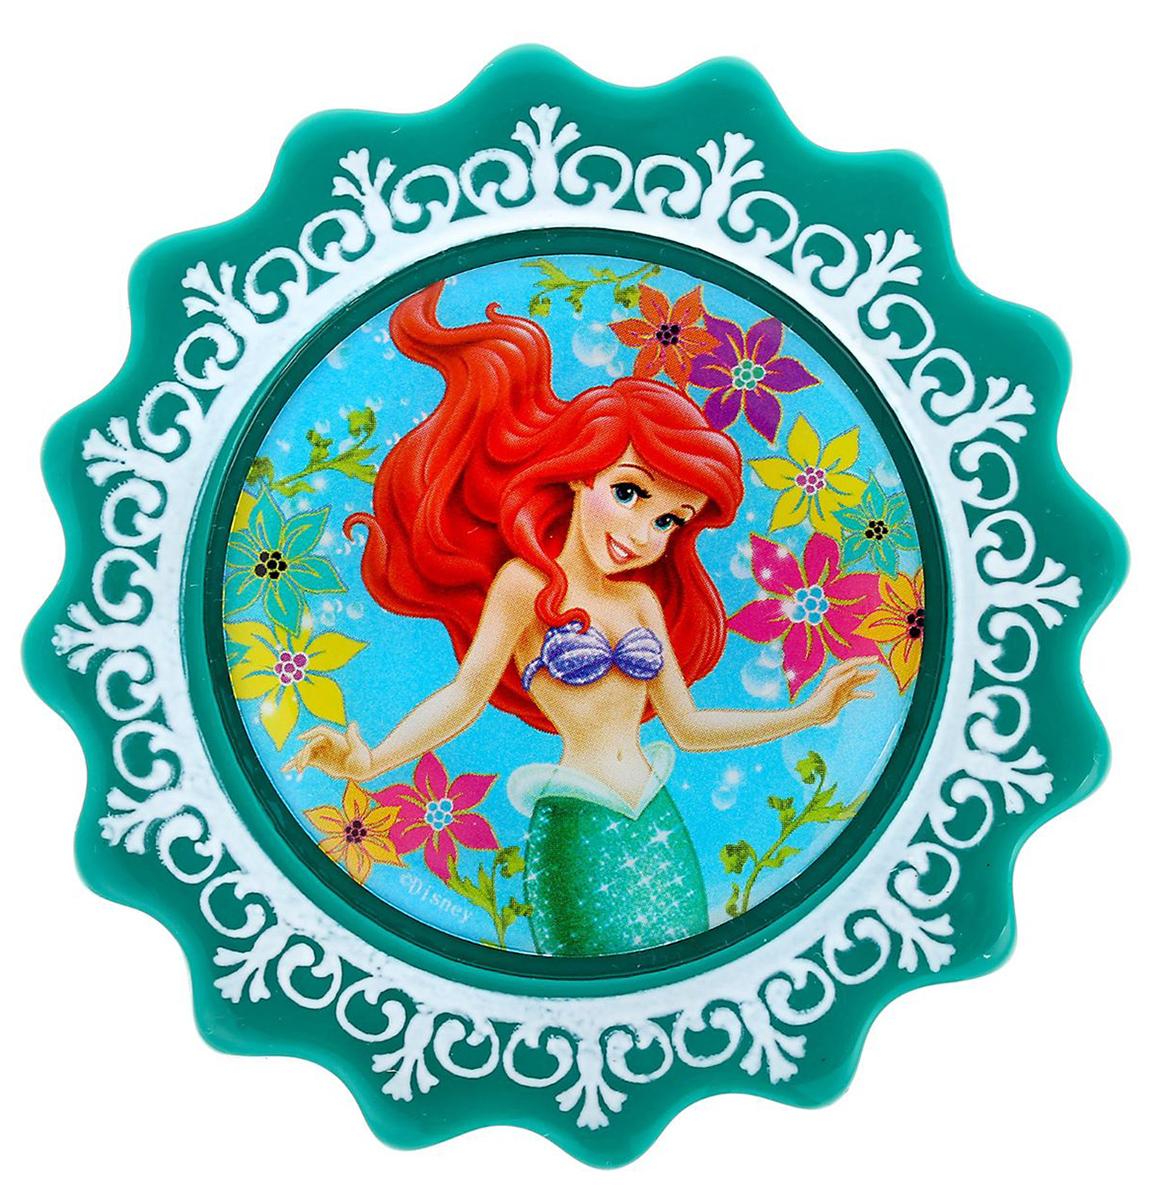 "Магнит-рамка Disney ""Ариэль"", 7 х 7 см. 1256847"